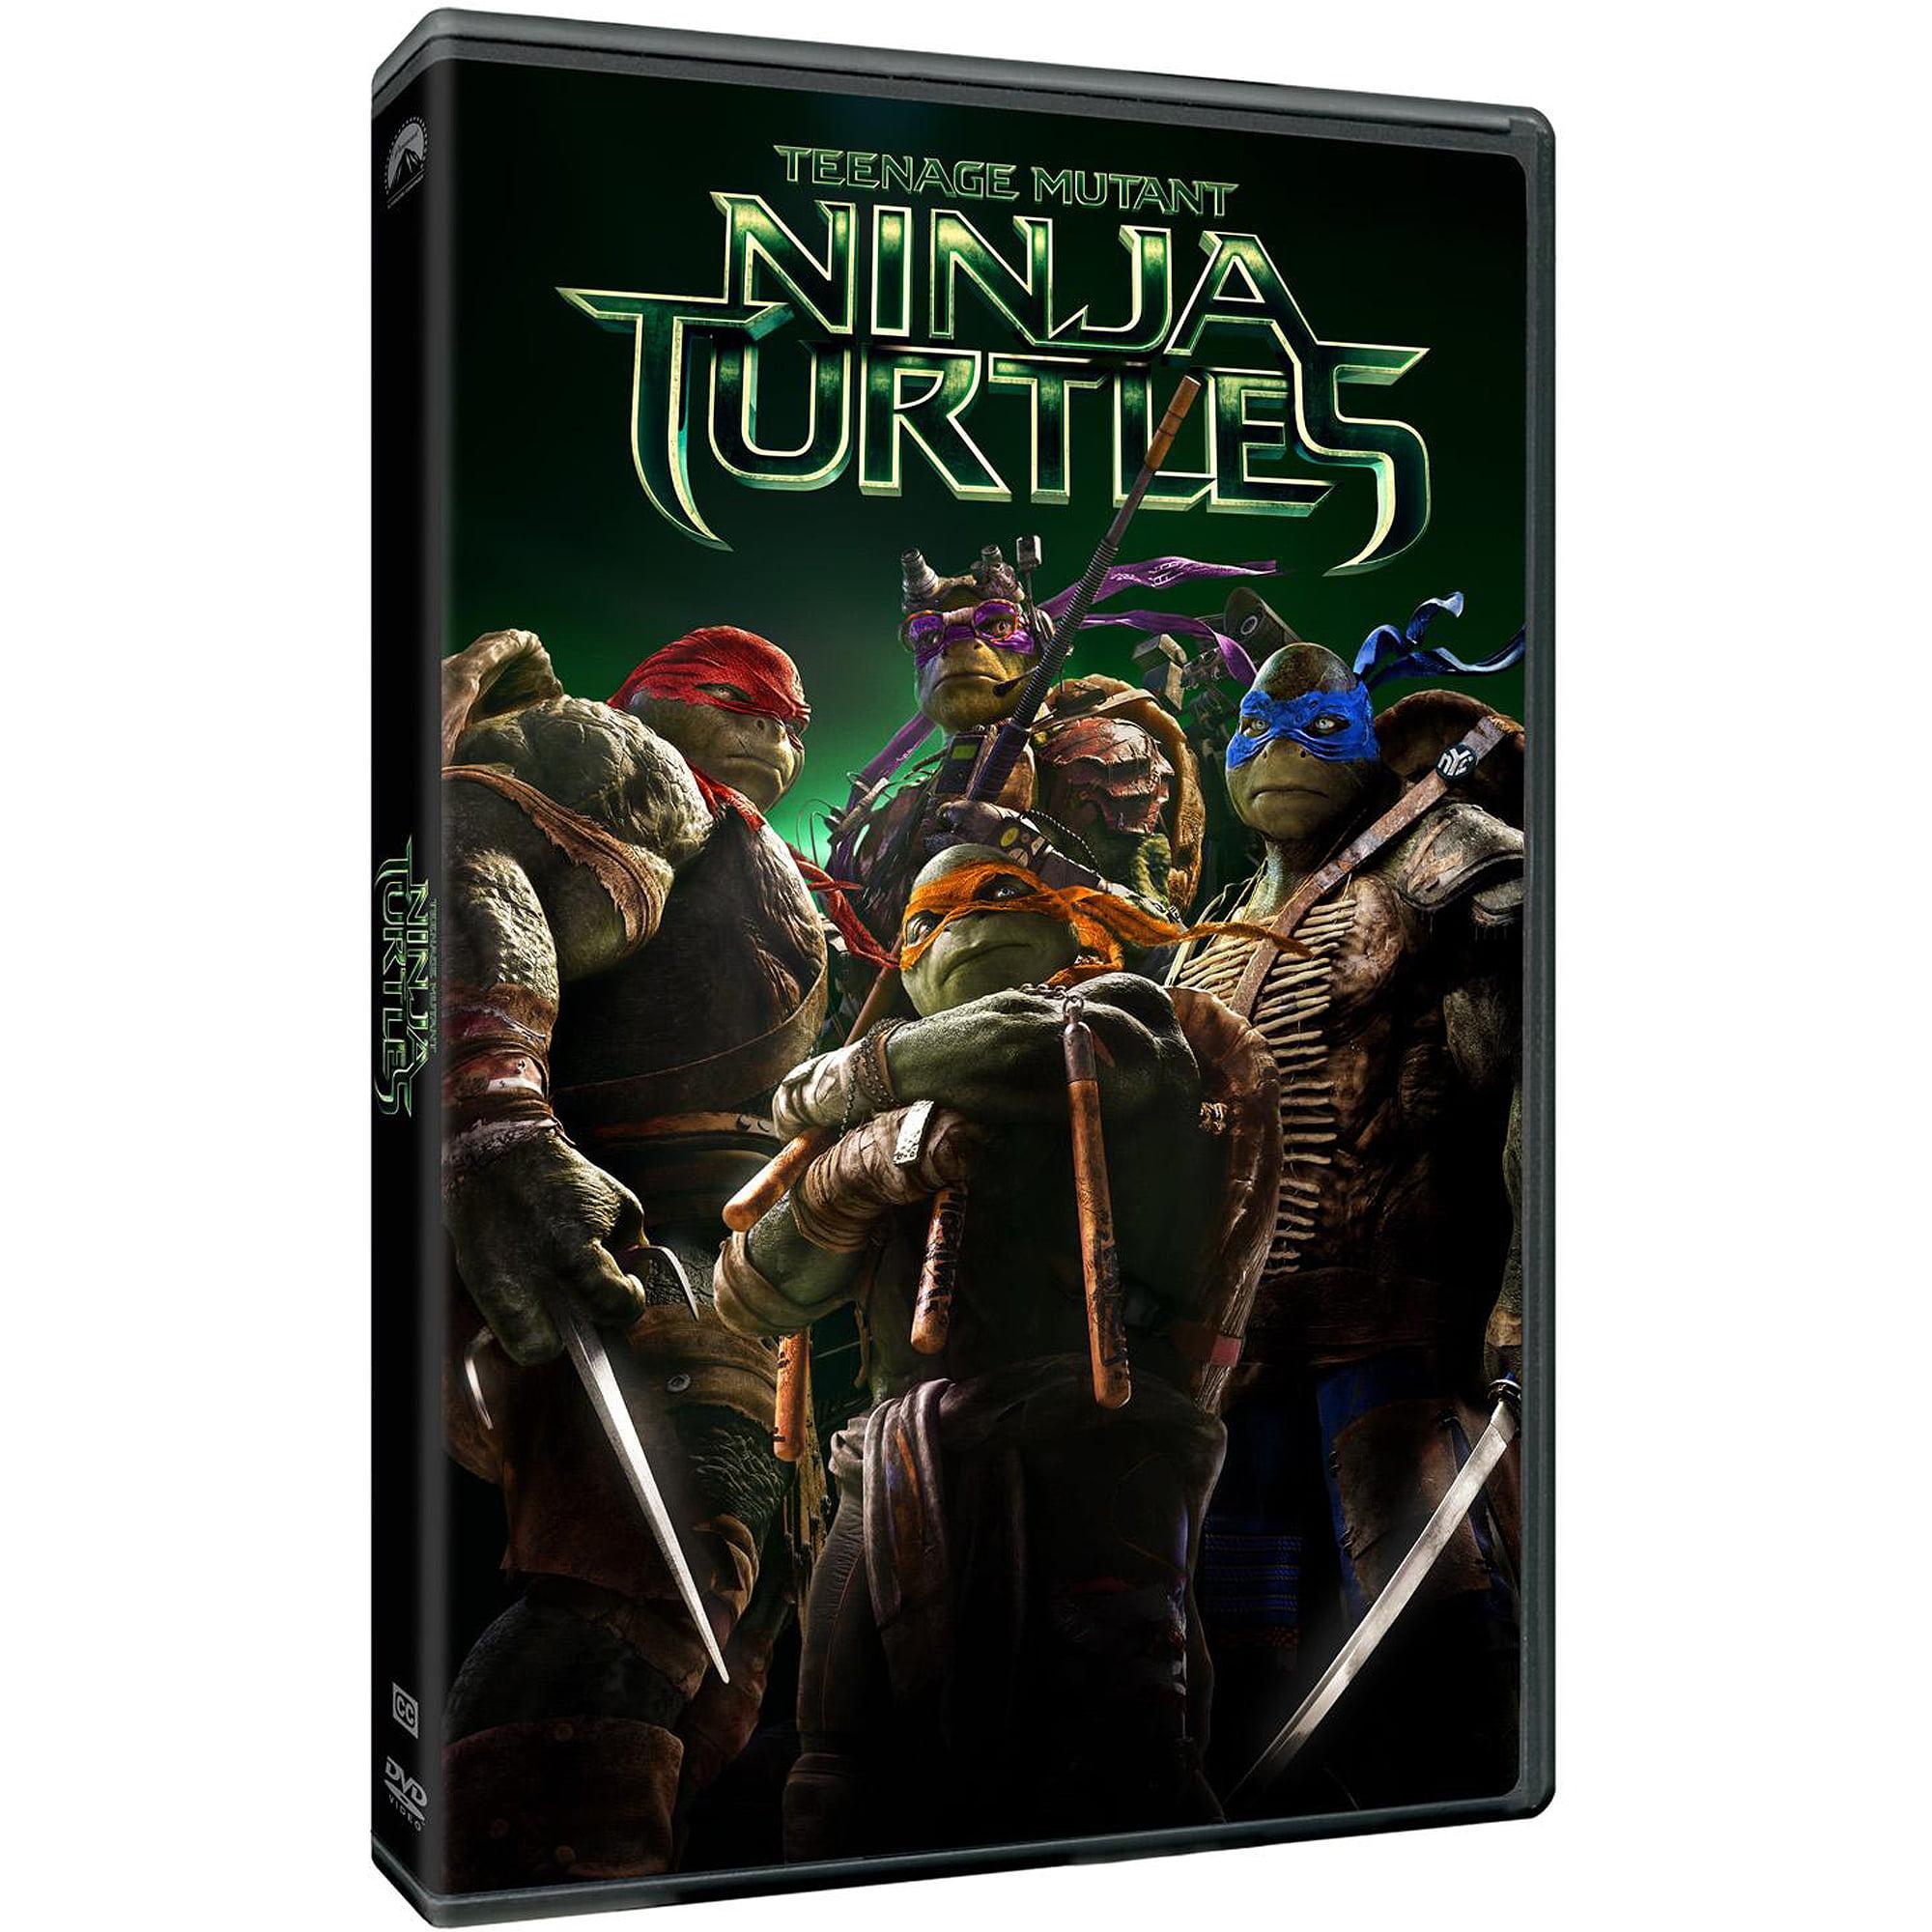 Teenage Mutant Ninja Turtles (2014) (DVD + Digital HD) (With INSTAWATCH) (Widescreen)